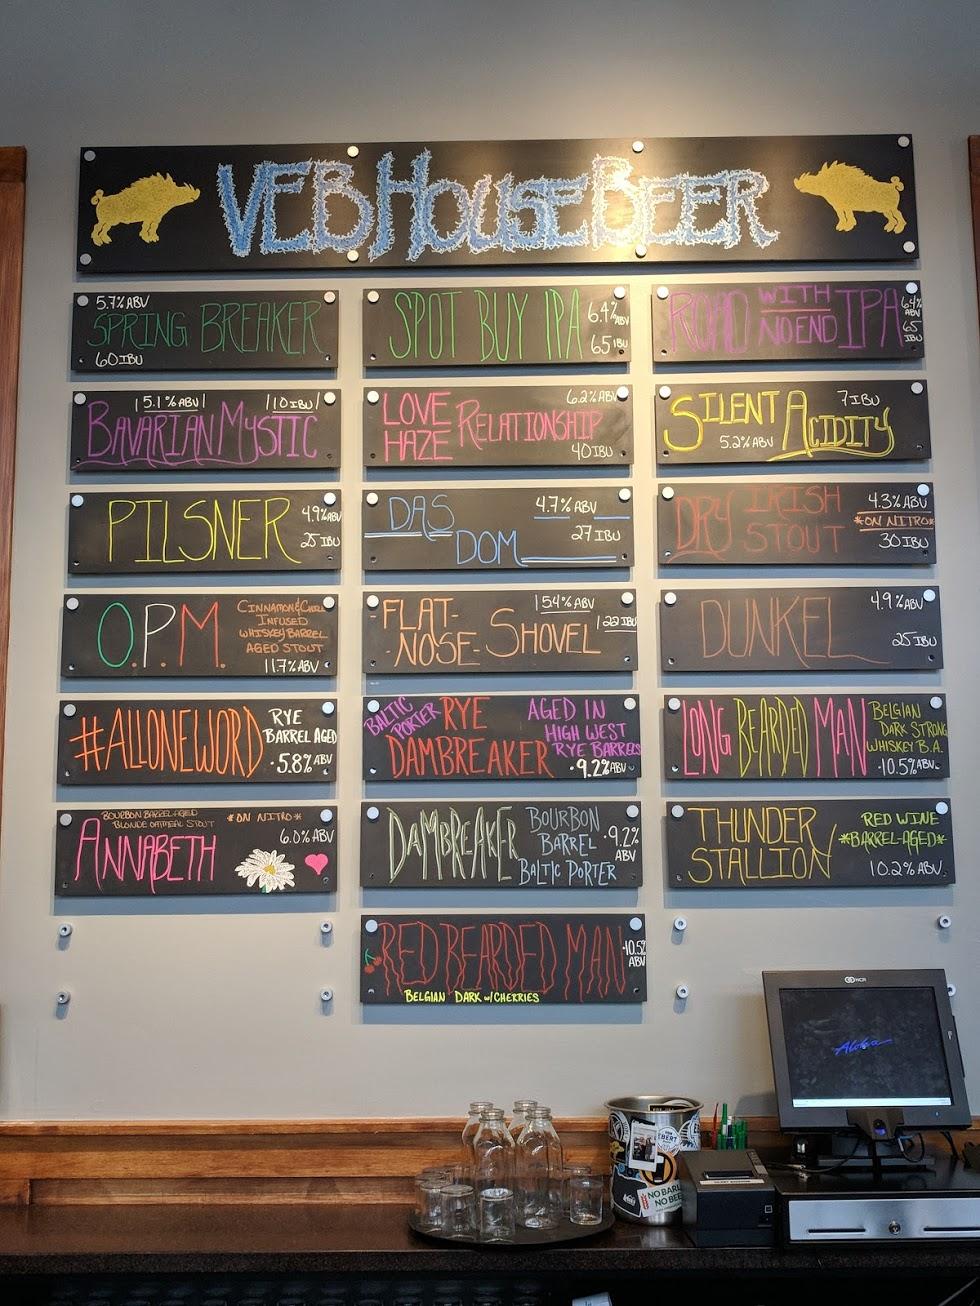 The beer menu at Von Ebert Brewing. (photo by Nick Rivers)